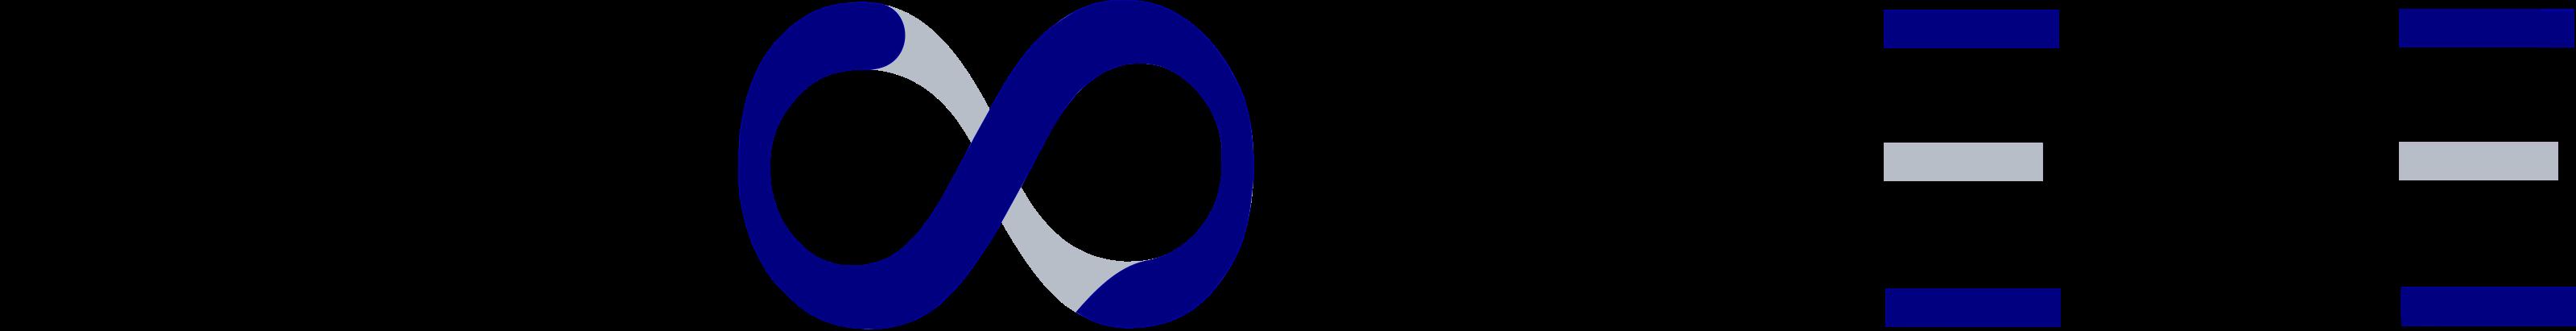 Unisphere gmbh member of. Vision clipart circular glass